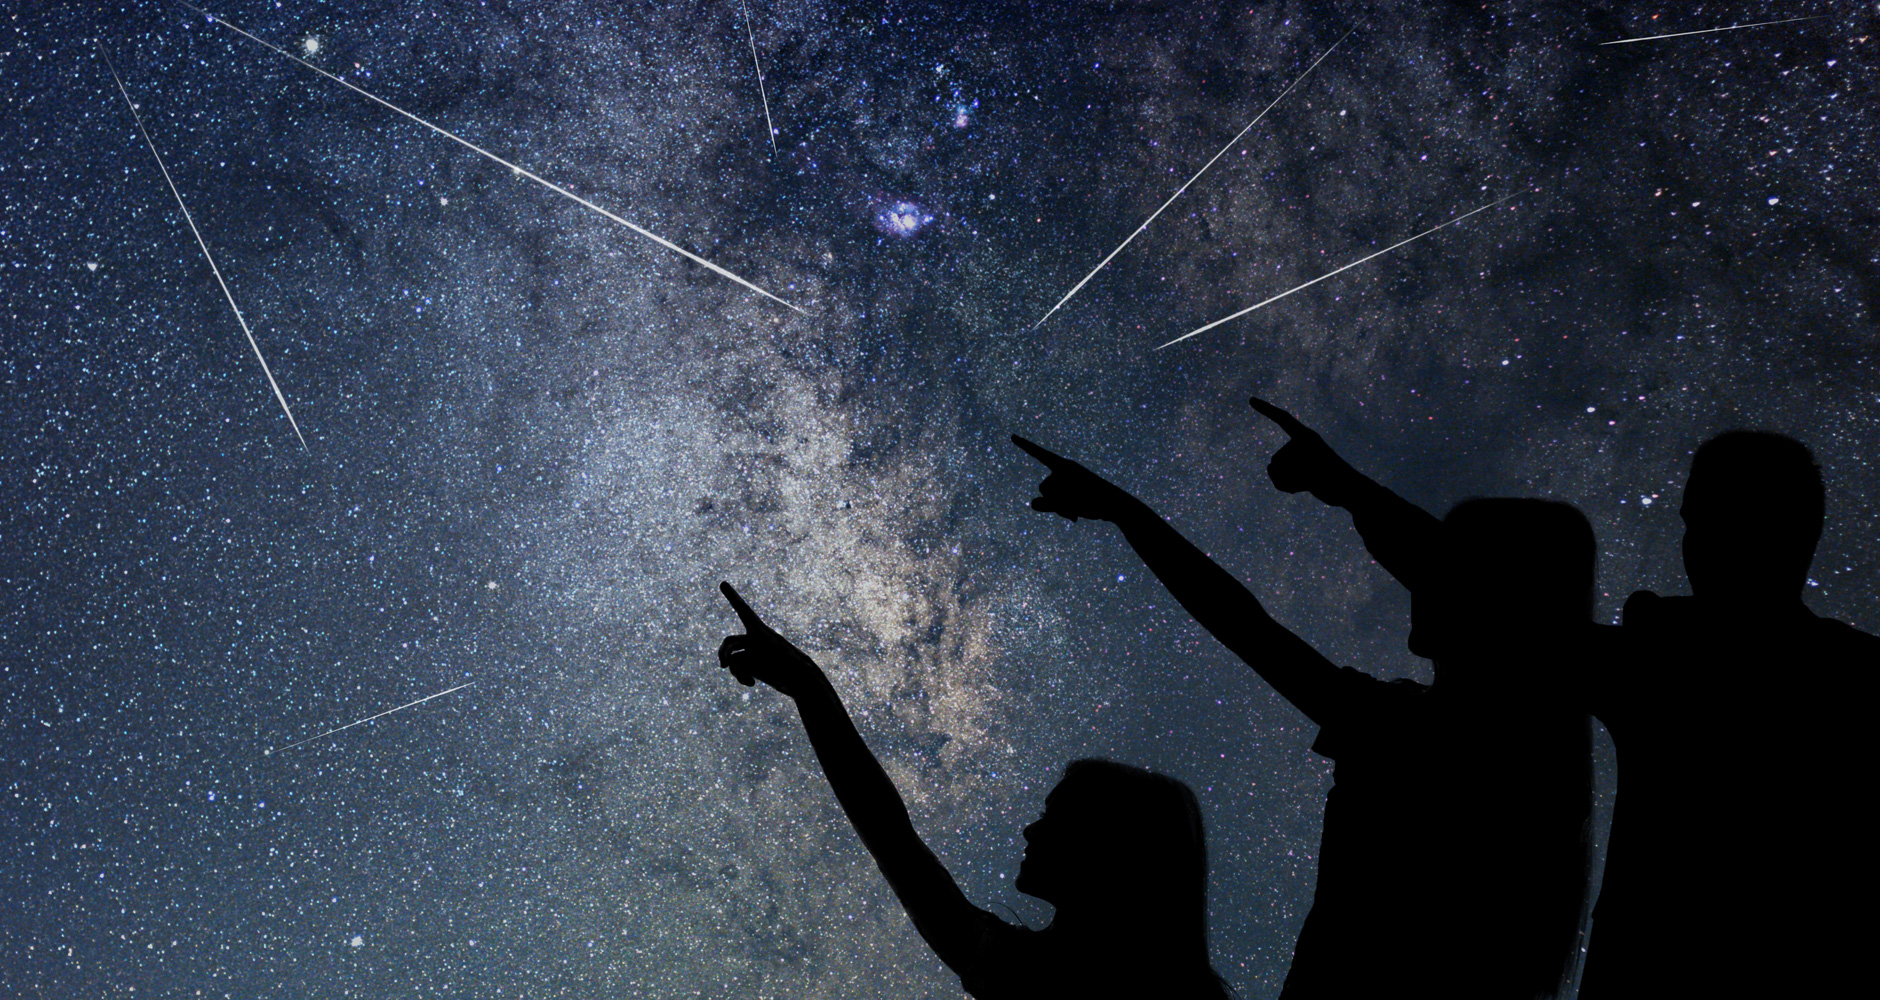 Meteor Showers Calendar - Farmers' Almanac